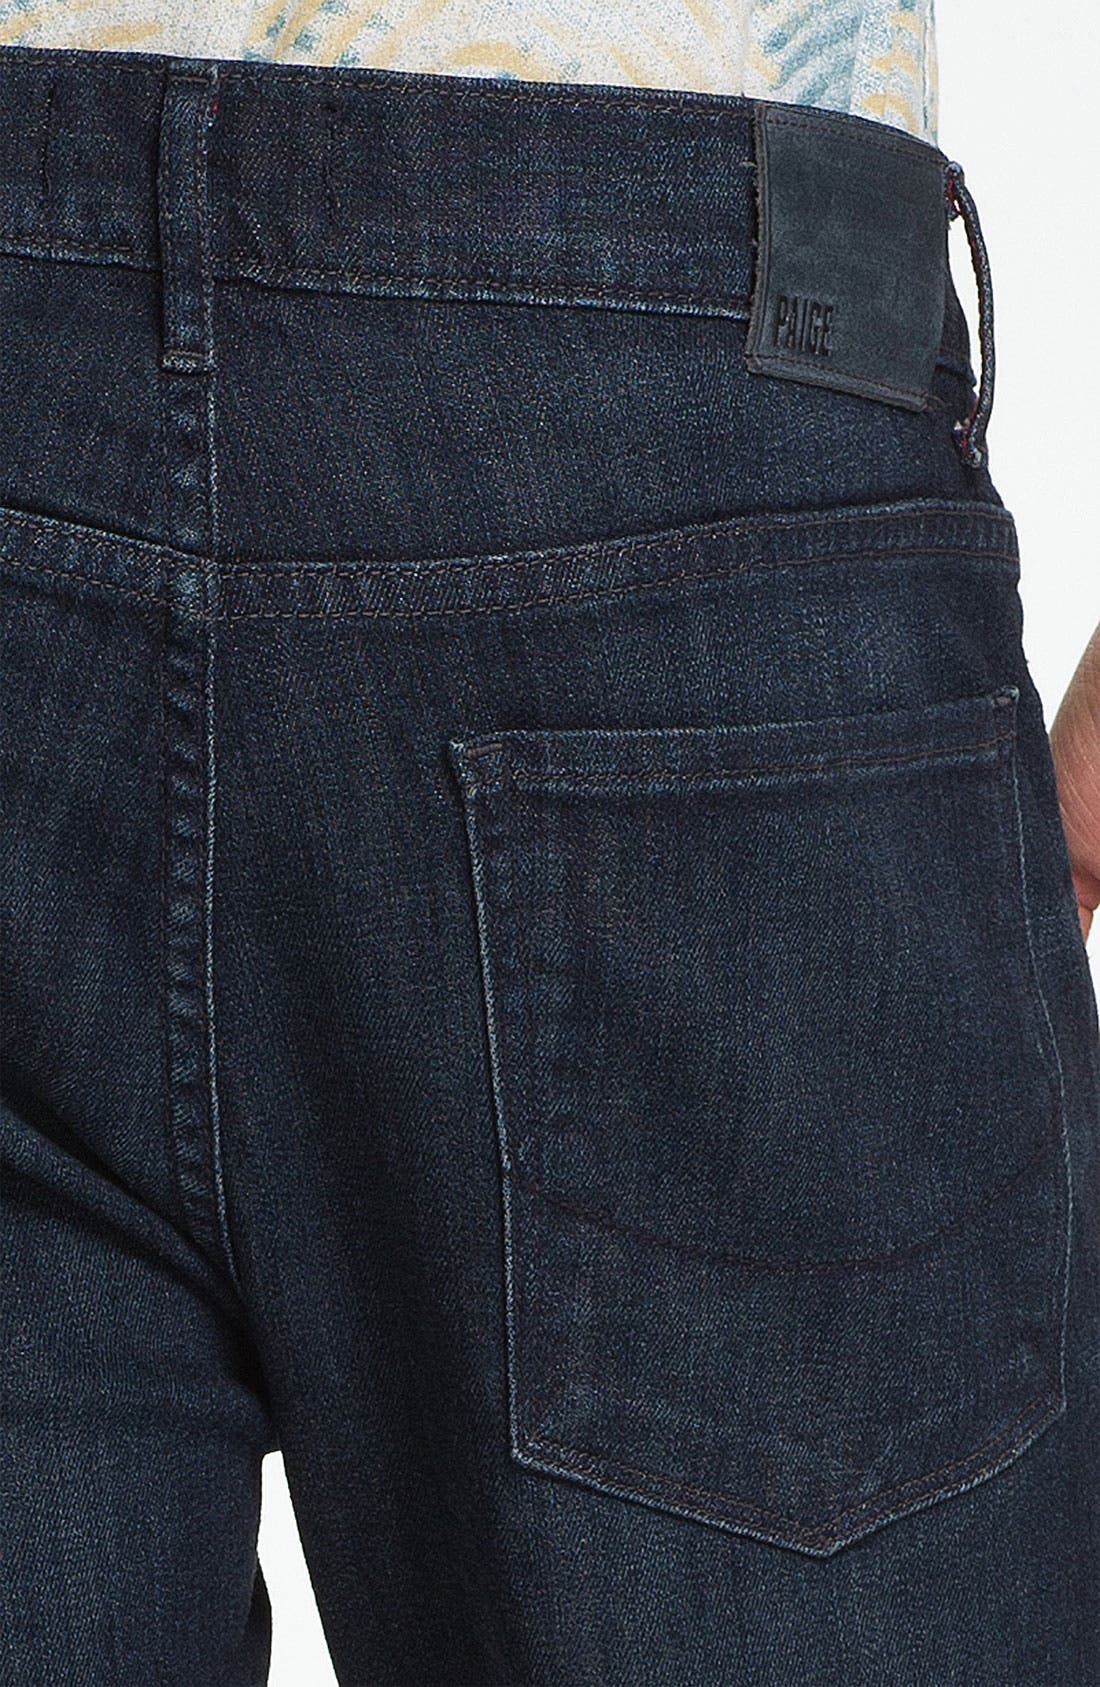 Alternate Image 4  - PAIGE 'Federal' Slim Straight Leg Jeans (Stingray)